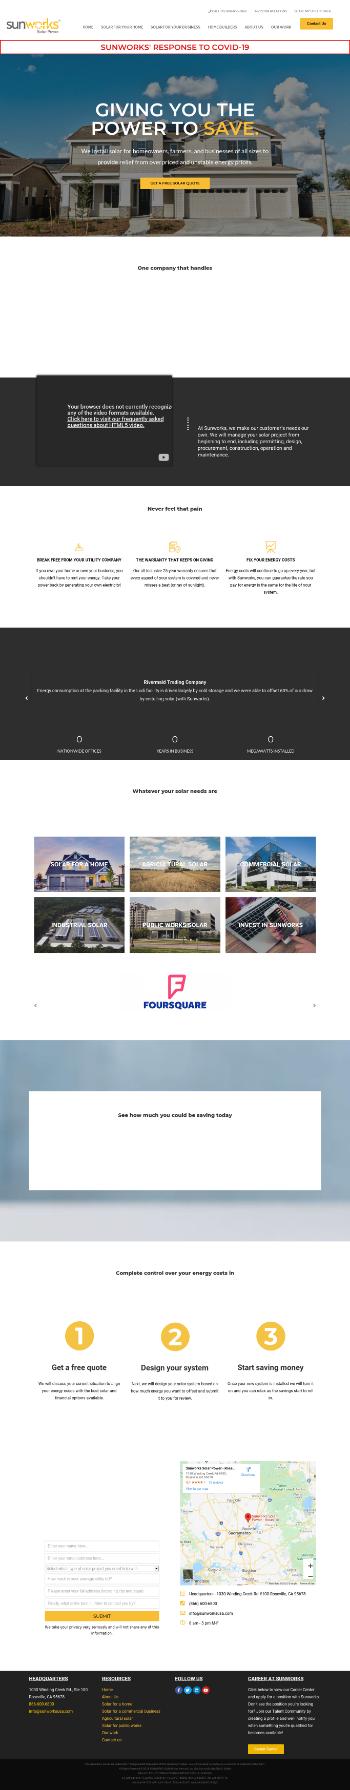 Sunworks, Inc. Website Screenshot